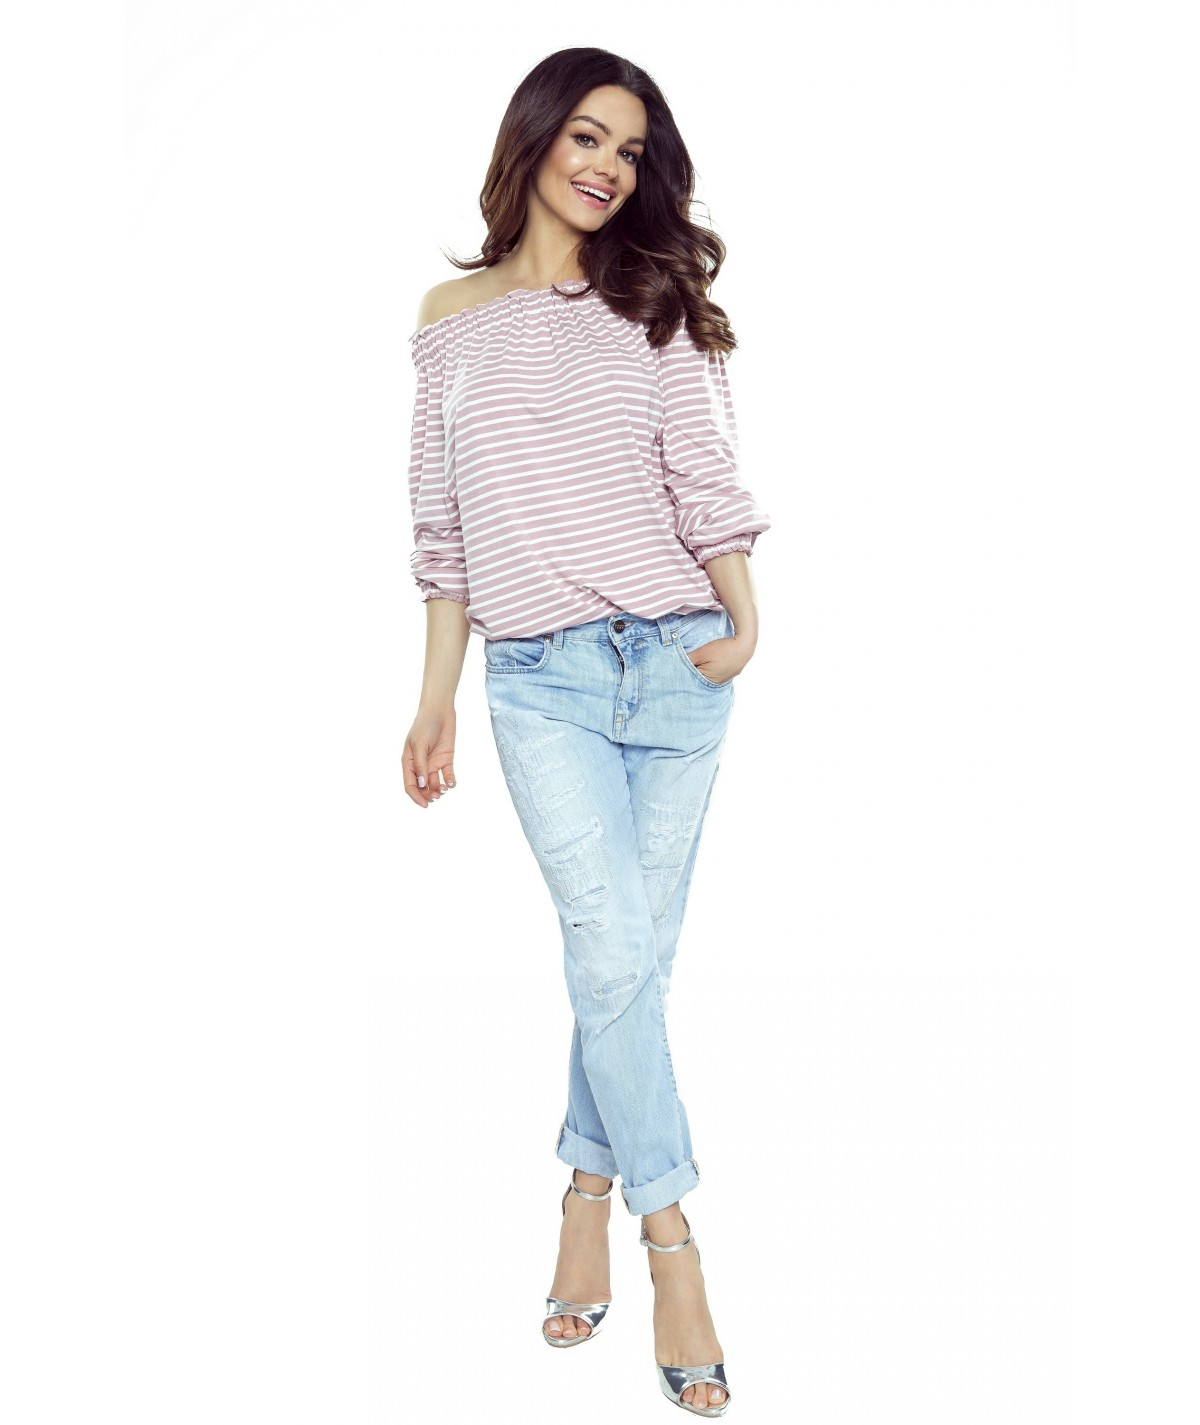 basicowa bluzka bergamo w paski - rózowa